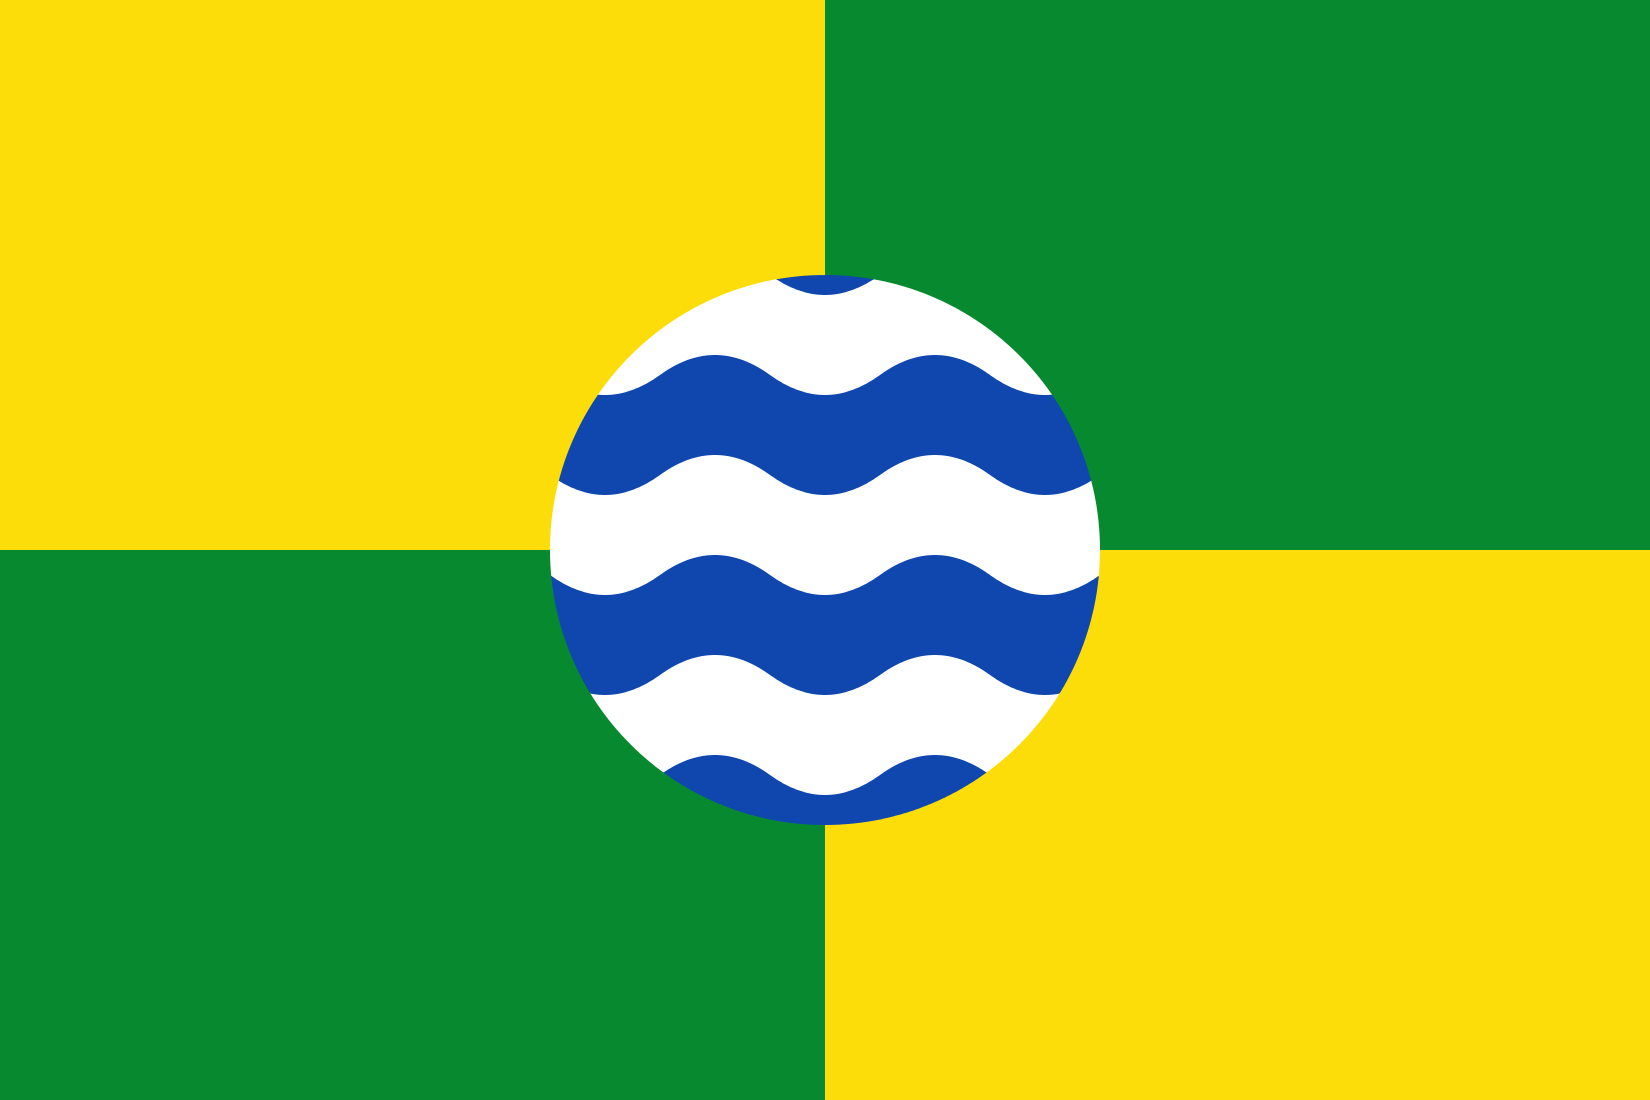 Flag of Nairobi County